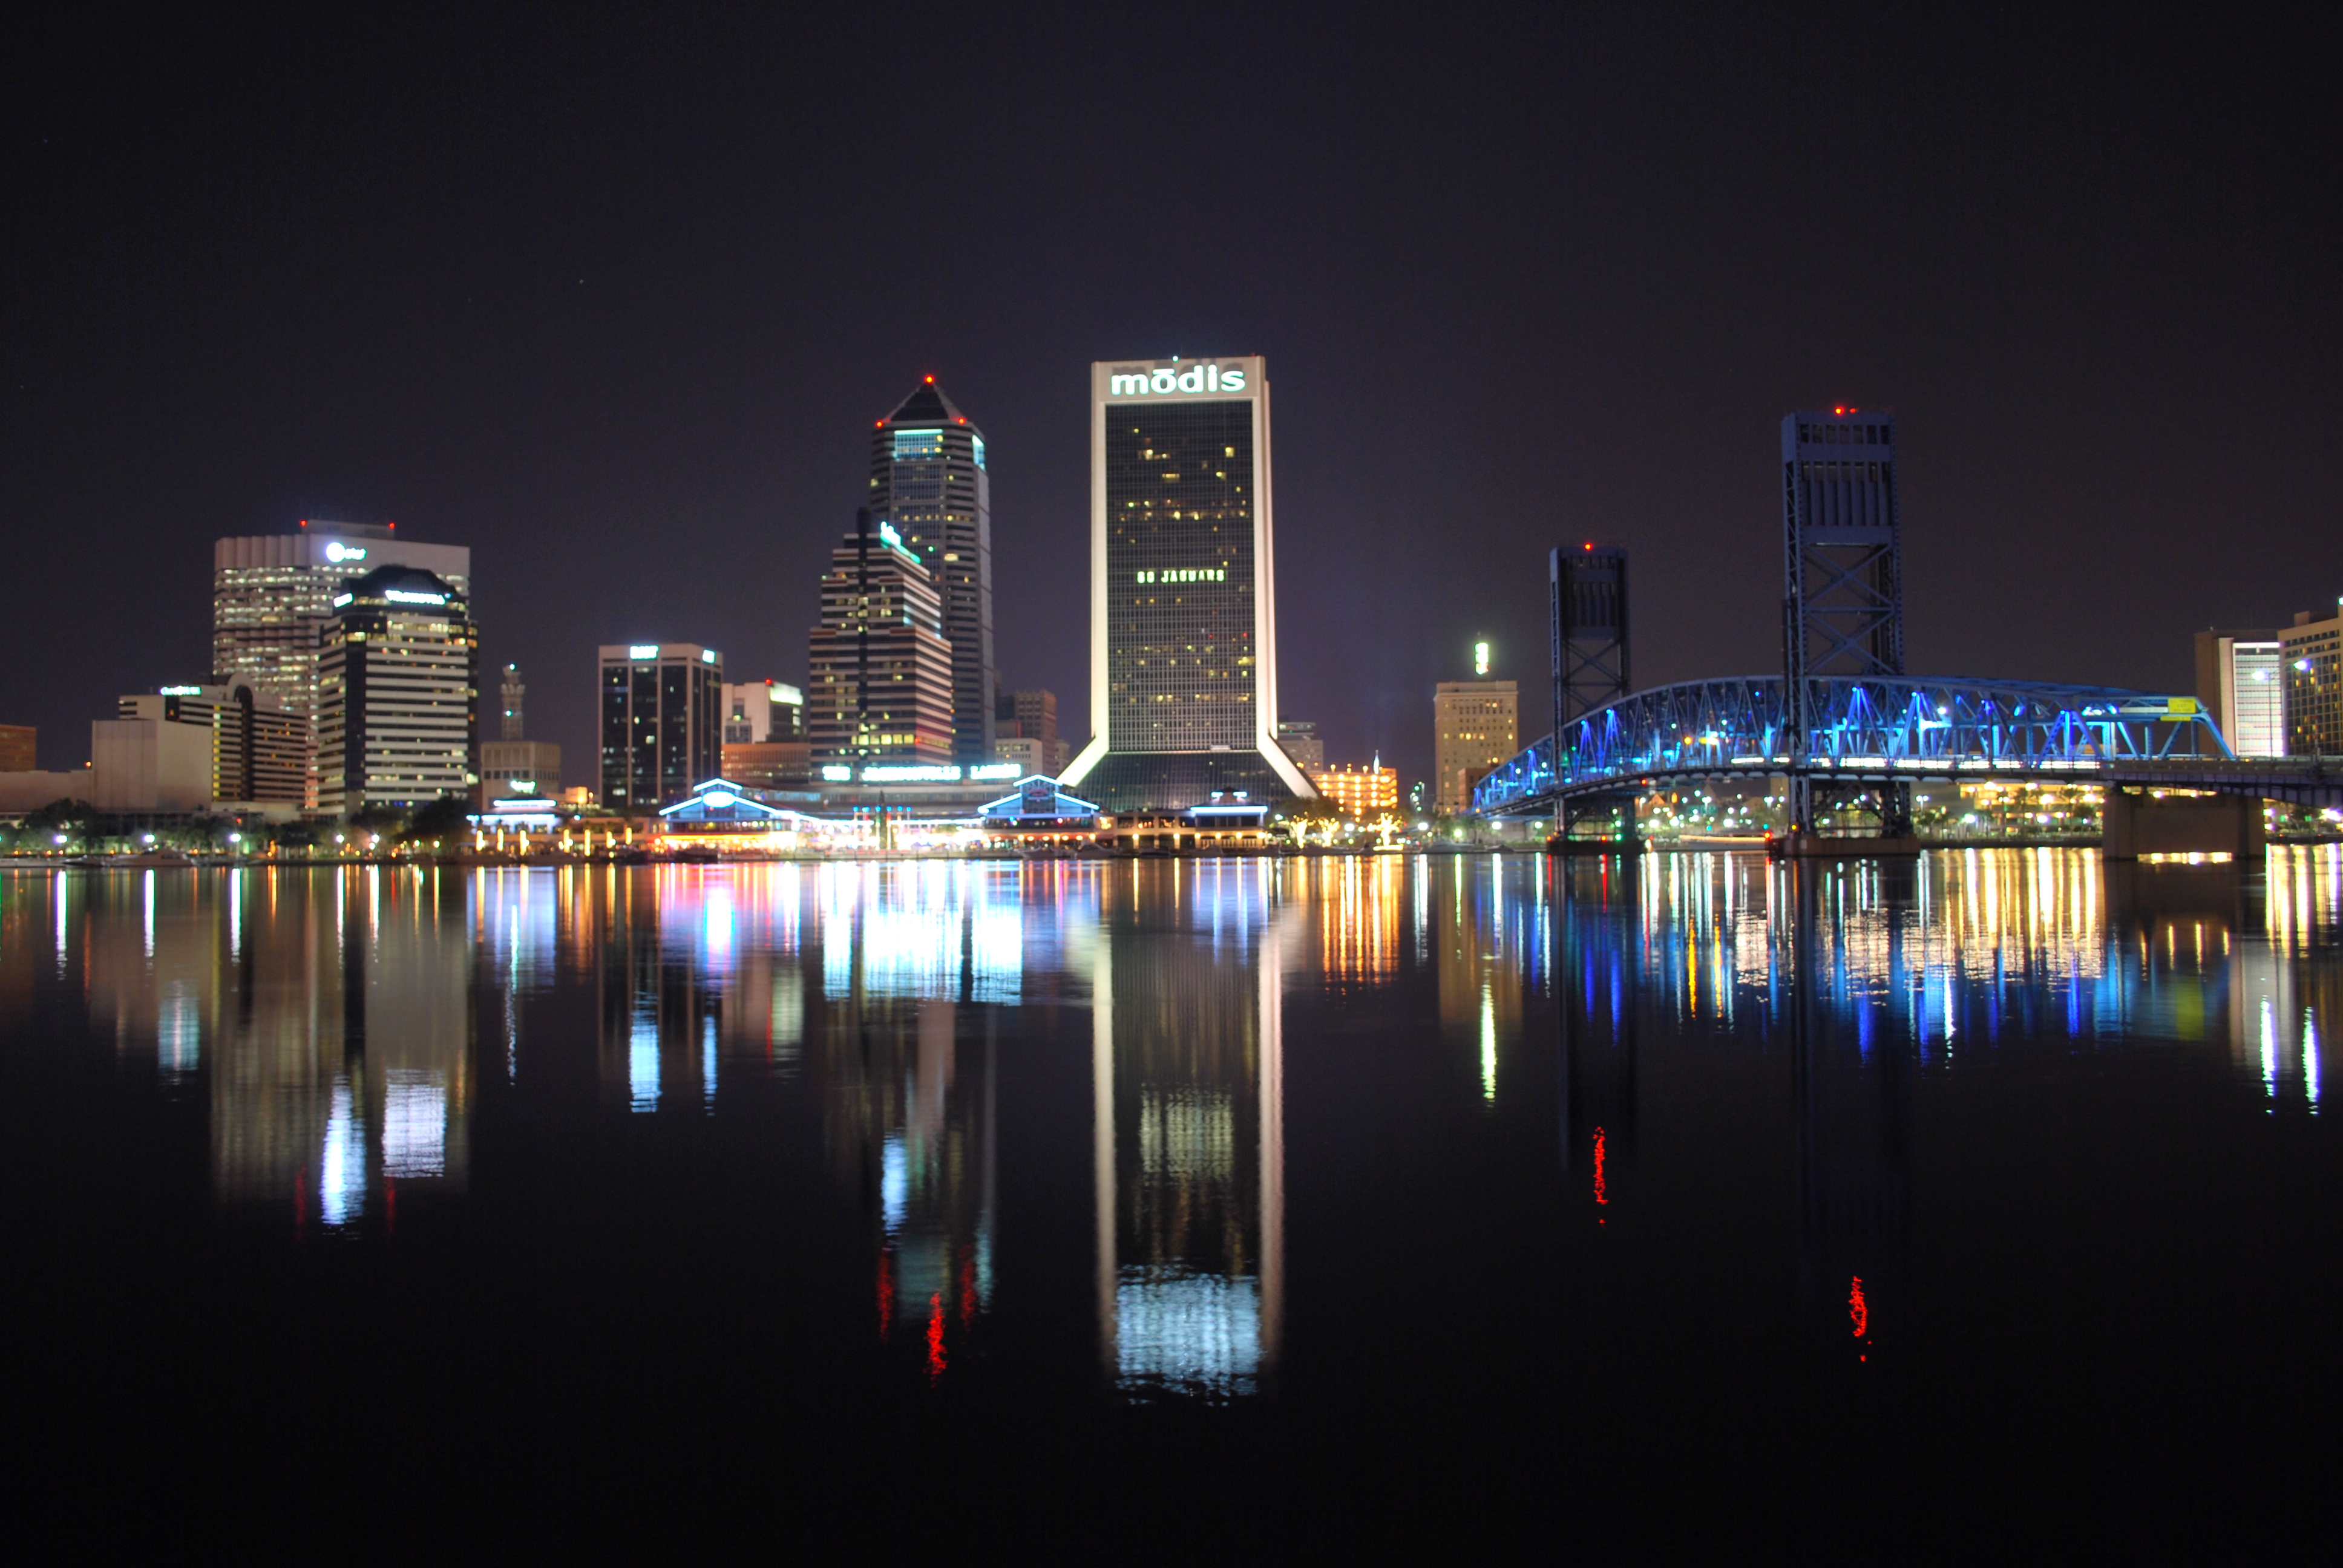 Jacksonville Florida Usa Stock Photo - Download Image Now ...  |Jacksonville Florida Photography